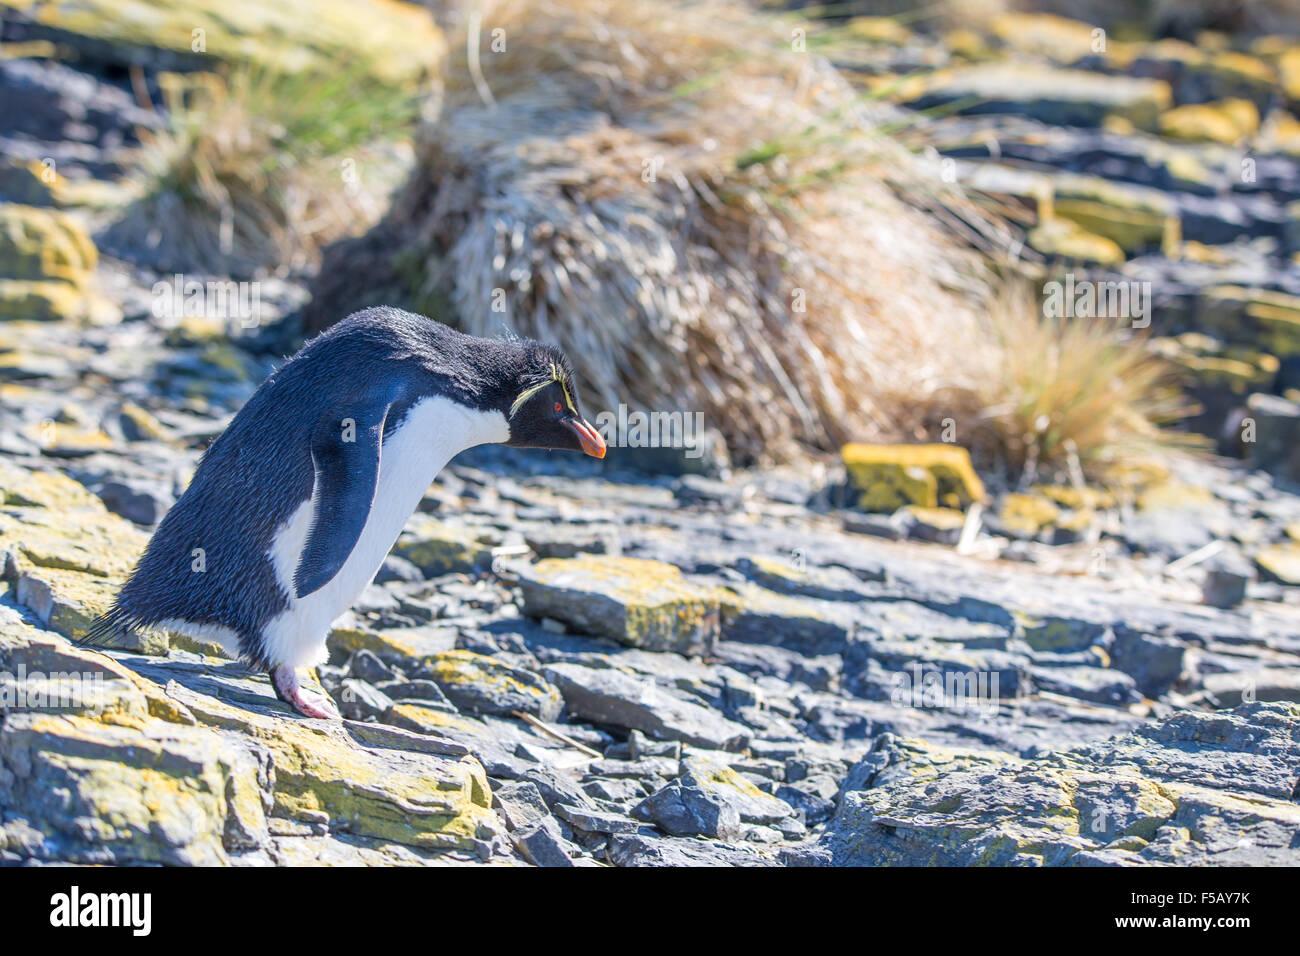 Rockhopper Penguin on rocks in colony Bleaker Island, Falkland Islands - Stock Image